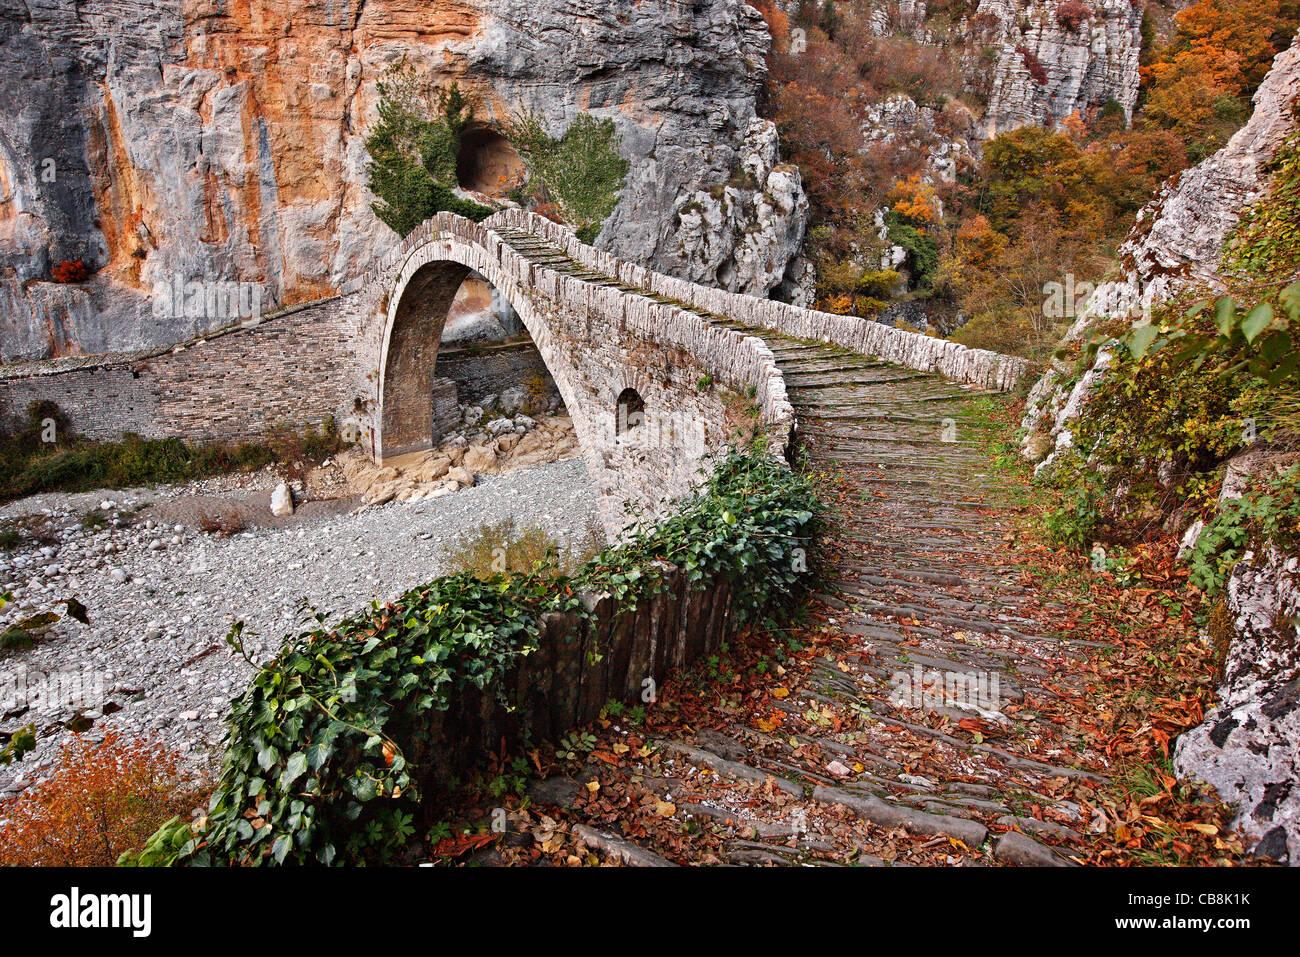 The beautiful stone bridge known as 'Kokkoris' or 'Noutsios' bridge, Zagori region, Ioannina,  Epirus, - Stock Image